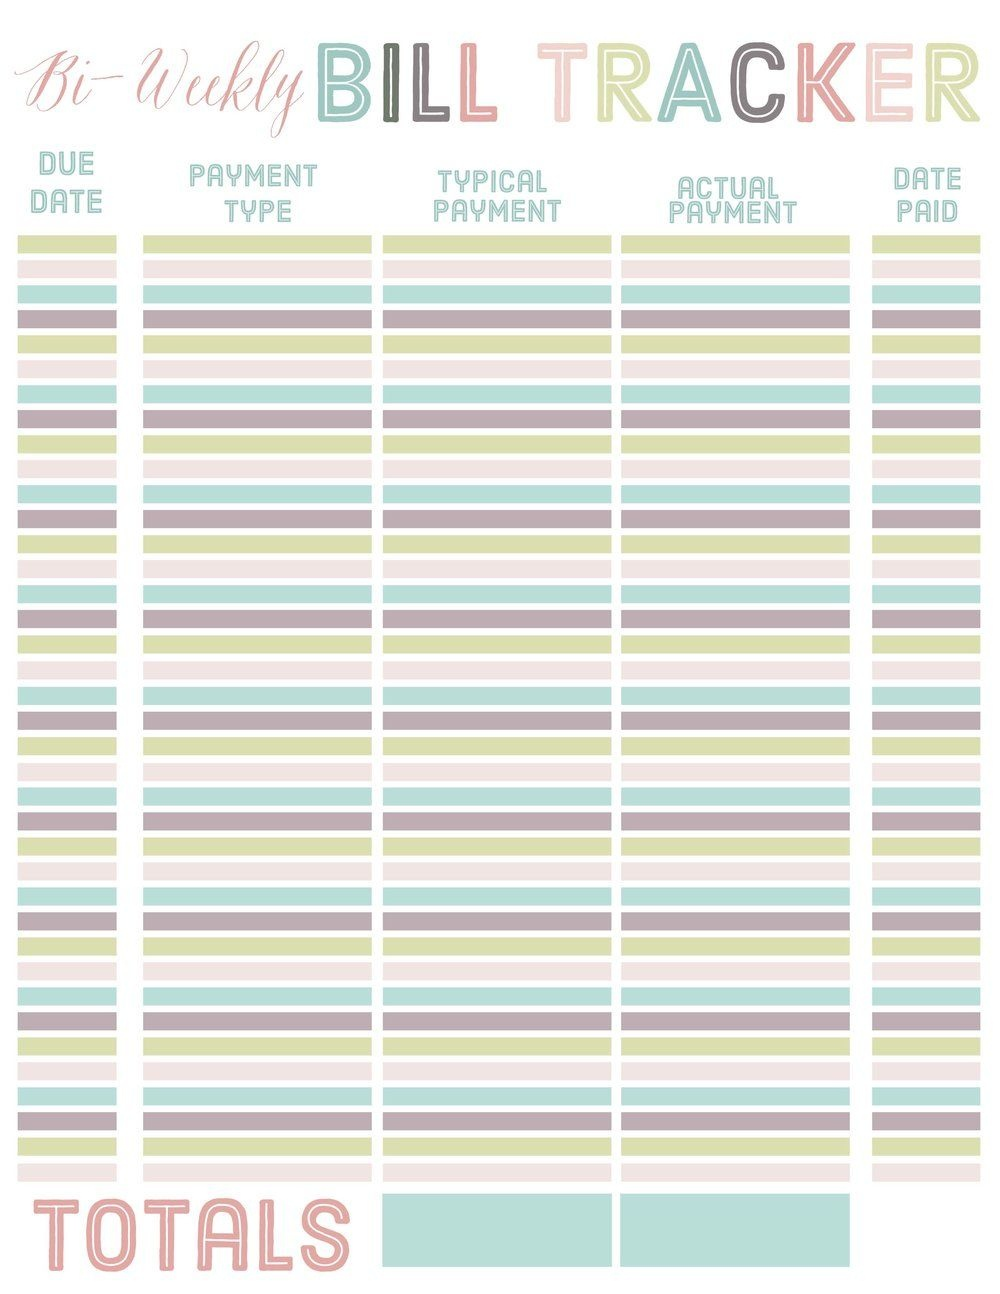 Free Budgeting And Finance Binder Printables | Budget Origanization - Free Printable Financial Binder